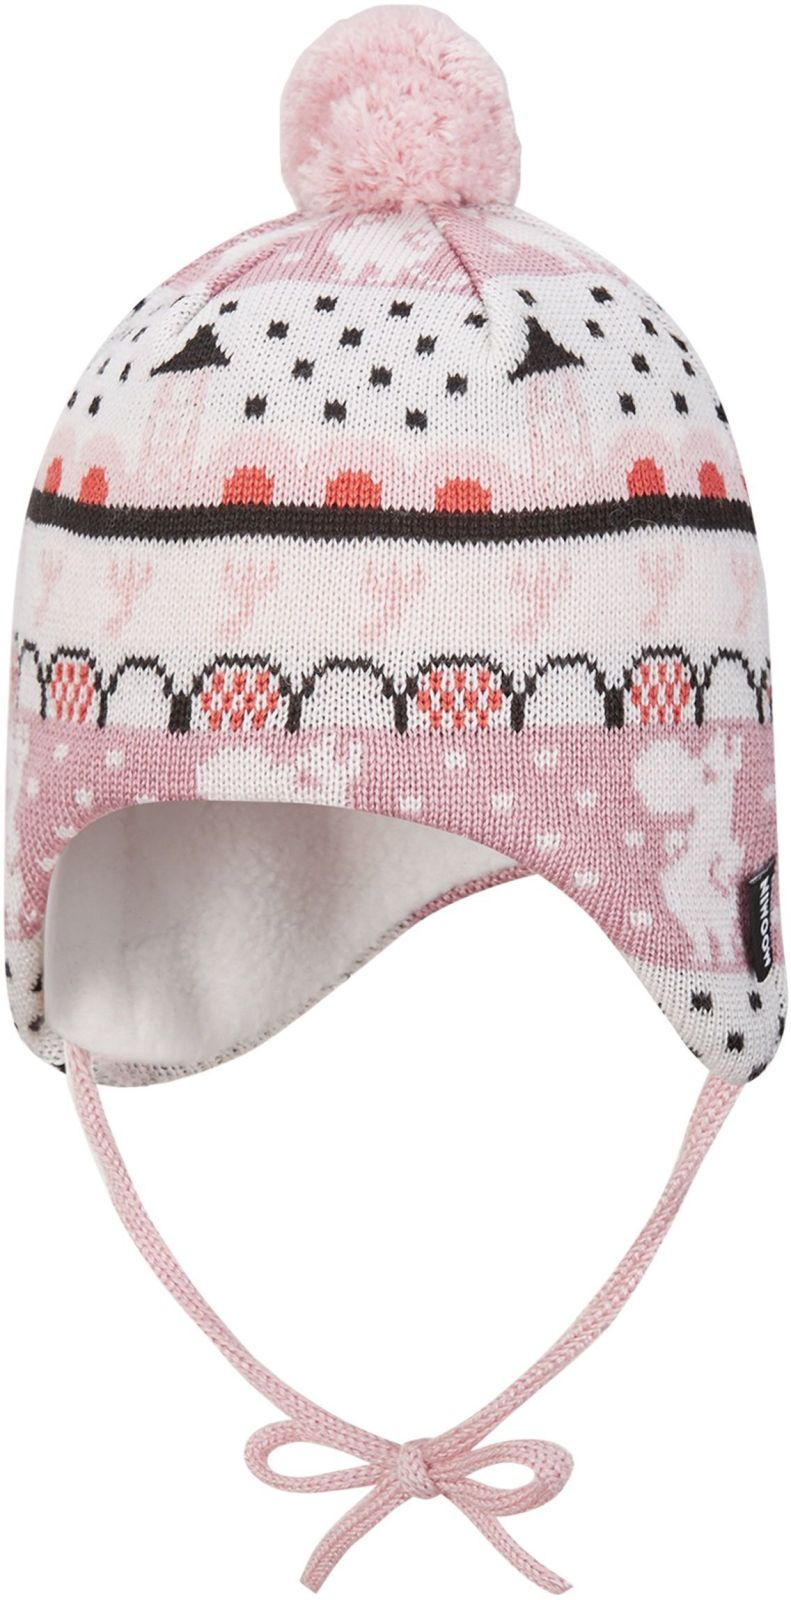 518575m-4301_Reima Moomin Yngst - Blush pink ruzova ciapka z vlny pre babatka